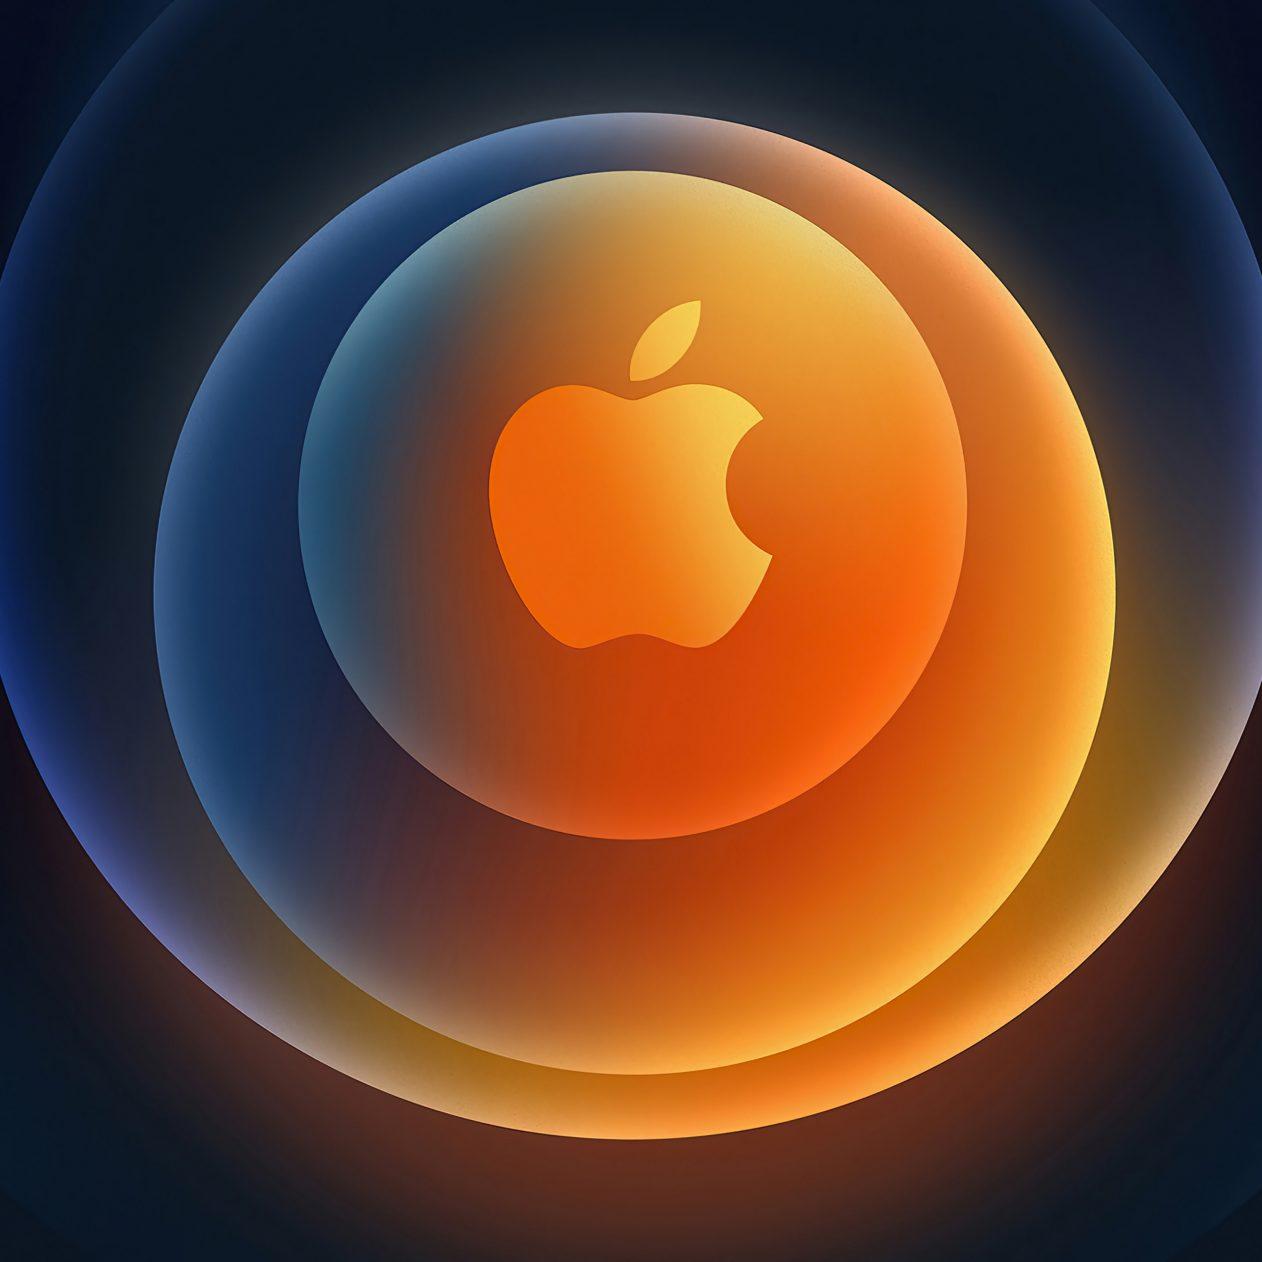 1262x1262 Parallax wallpaper 4k iPhone 12 Apple Logo Circles iPad Wallpaper 1262x1262 pixels resolution